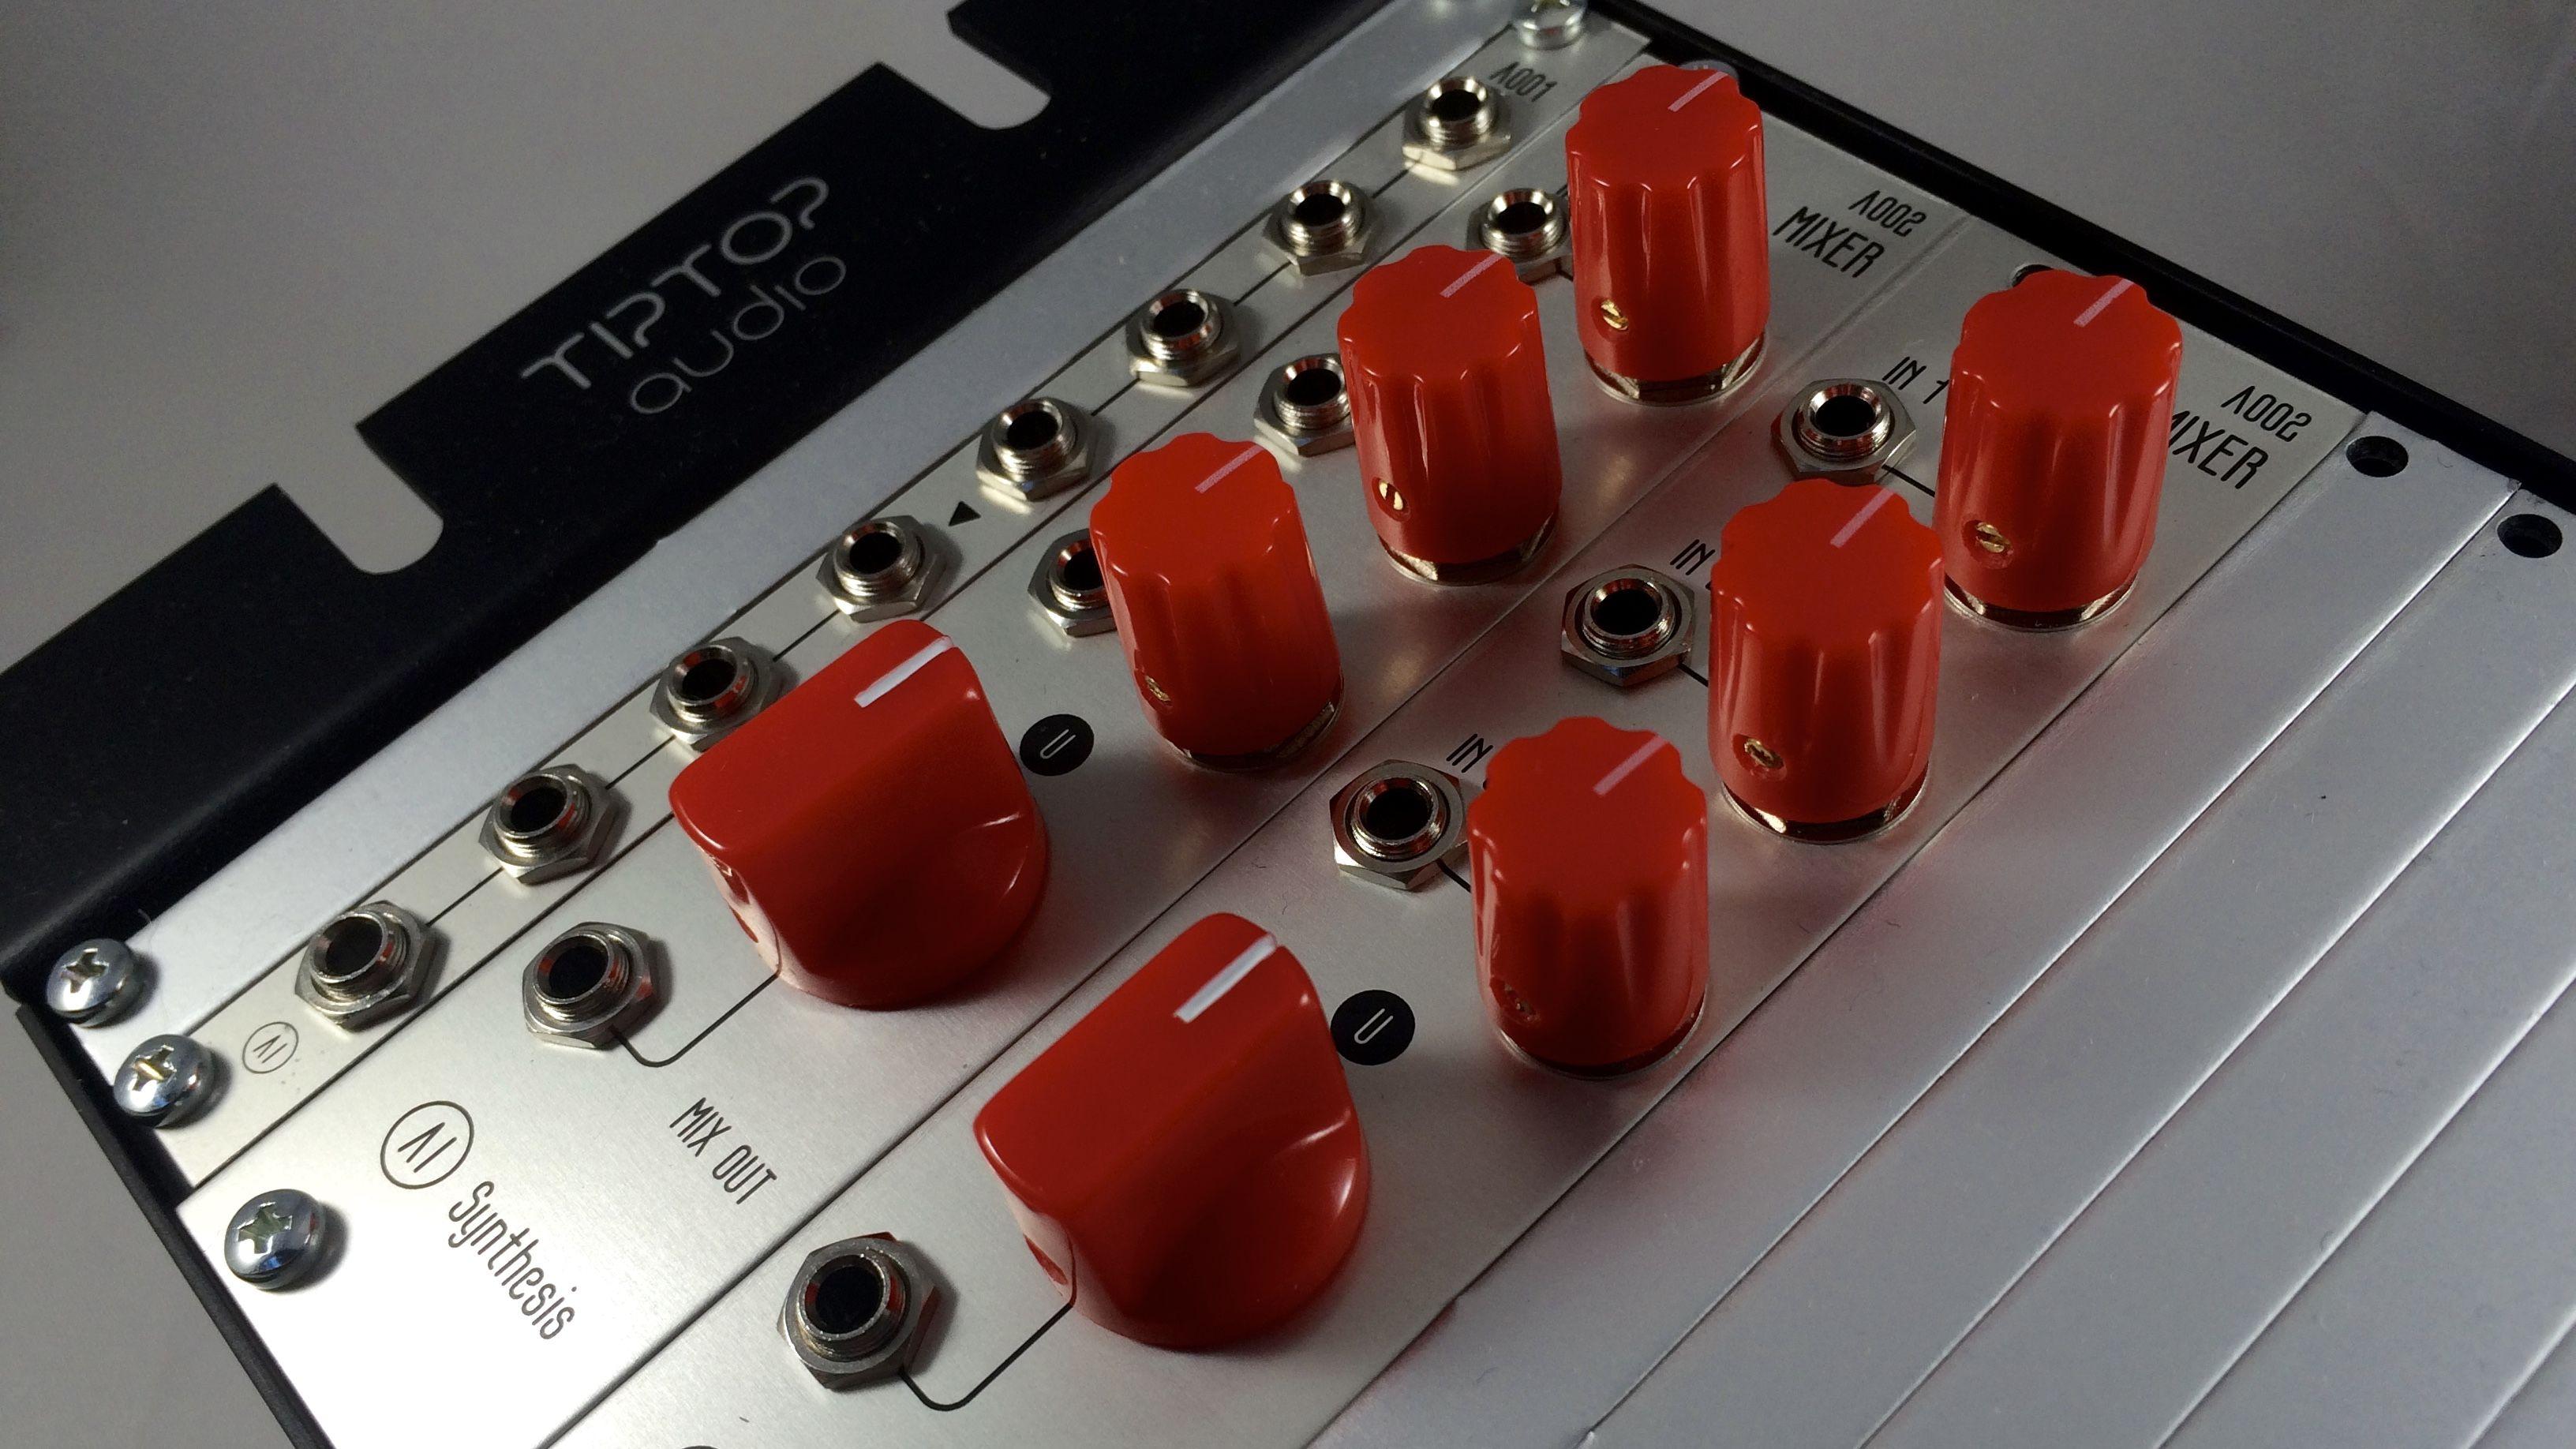 Diy synthesizer mixer module build guide diy store diy kit